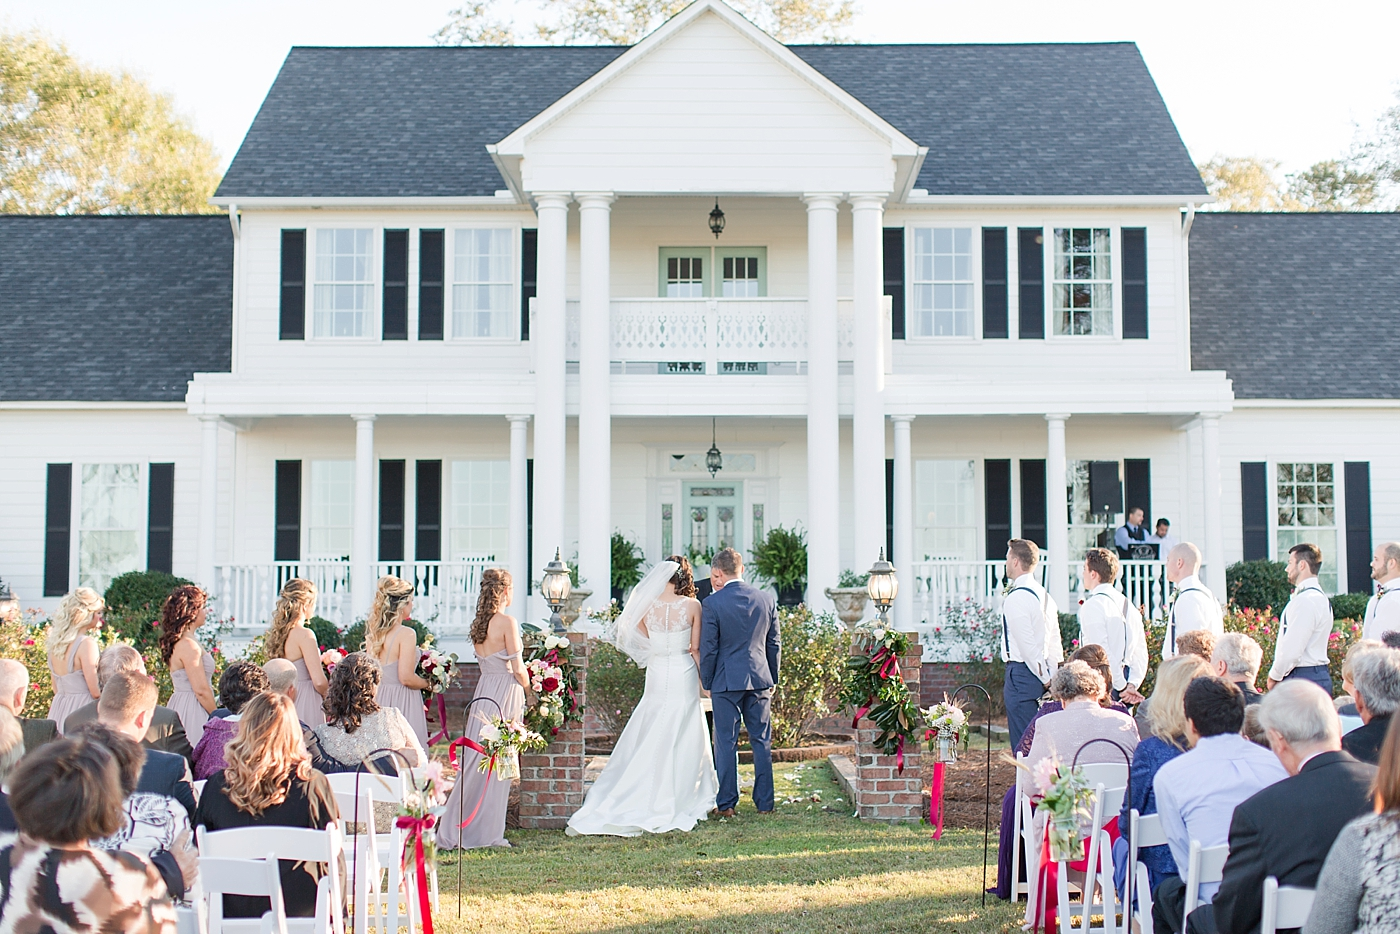 greenville-nc-wedding-the-robins-nest_22.jpg